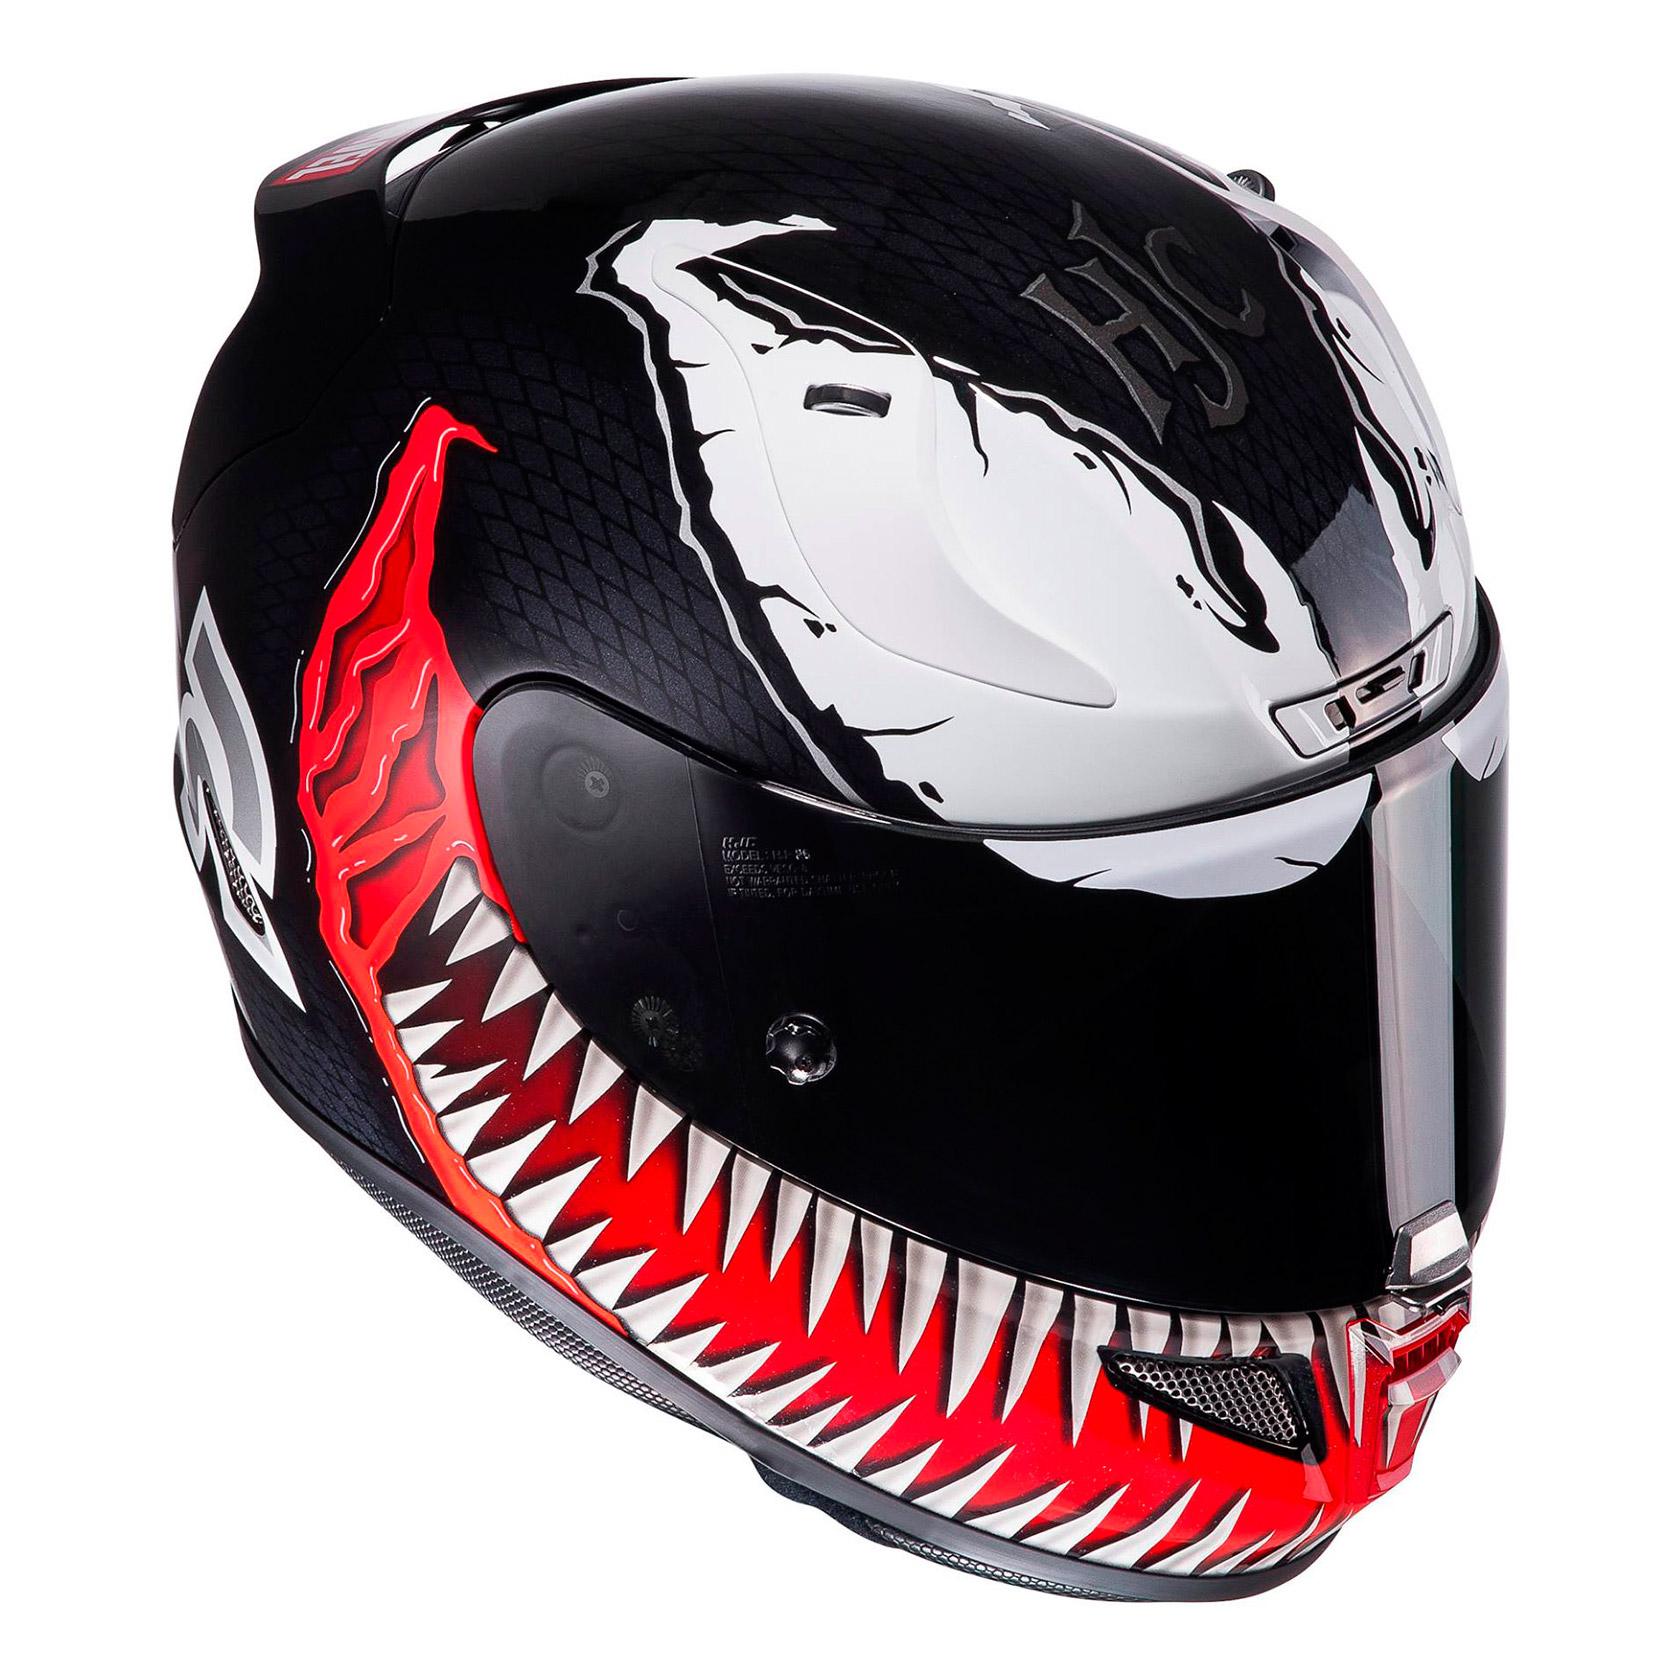 Casco Hjc Rpha 11 Venom Quot Marvel Quot En Motorbike Store